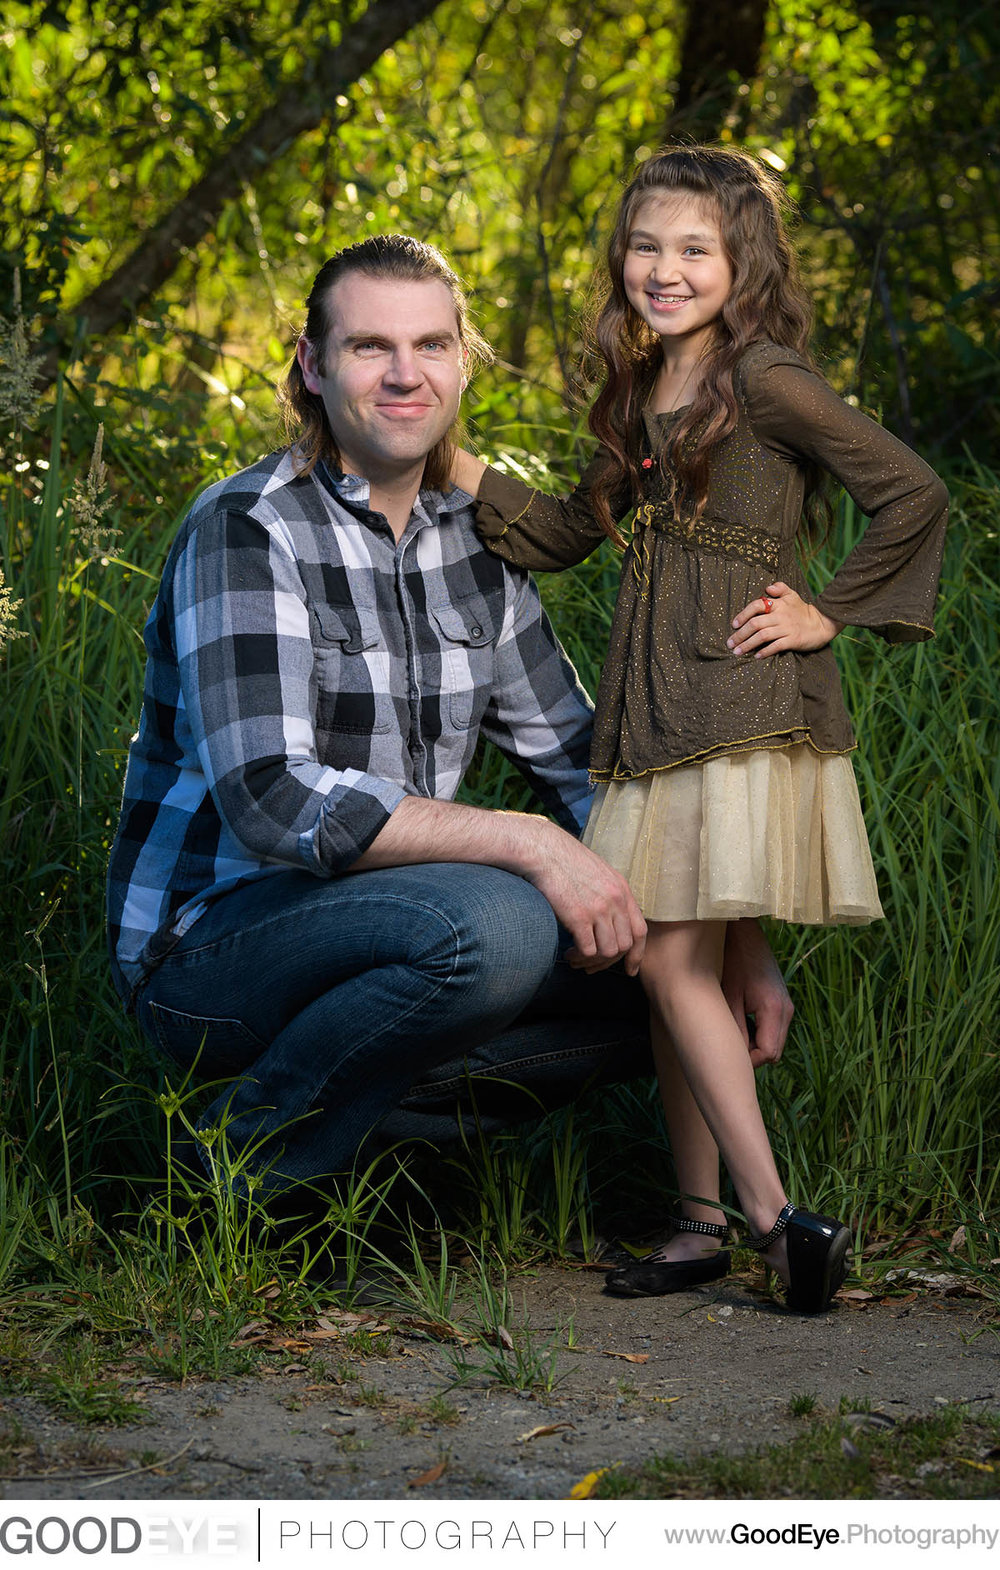 Family photos at Quail Hollow Ranch in Felton, California - phot